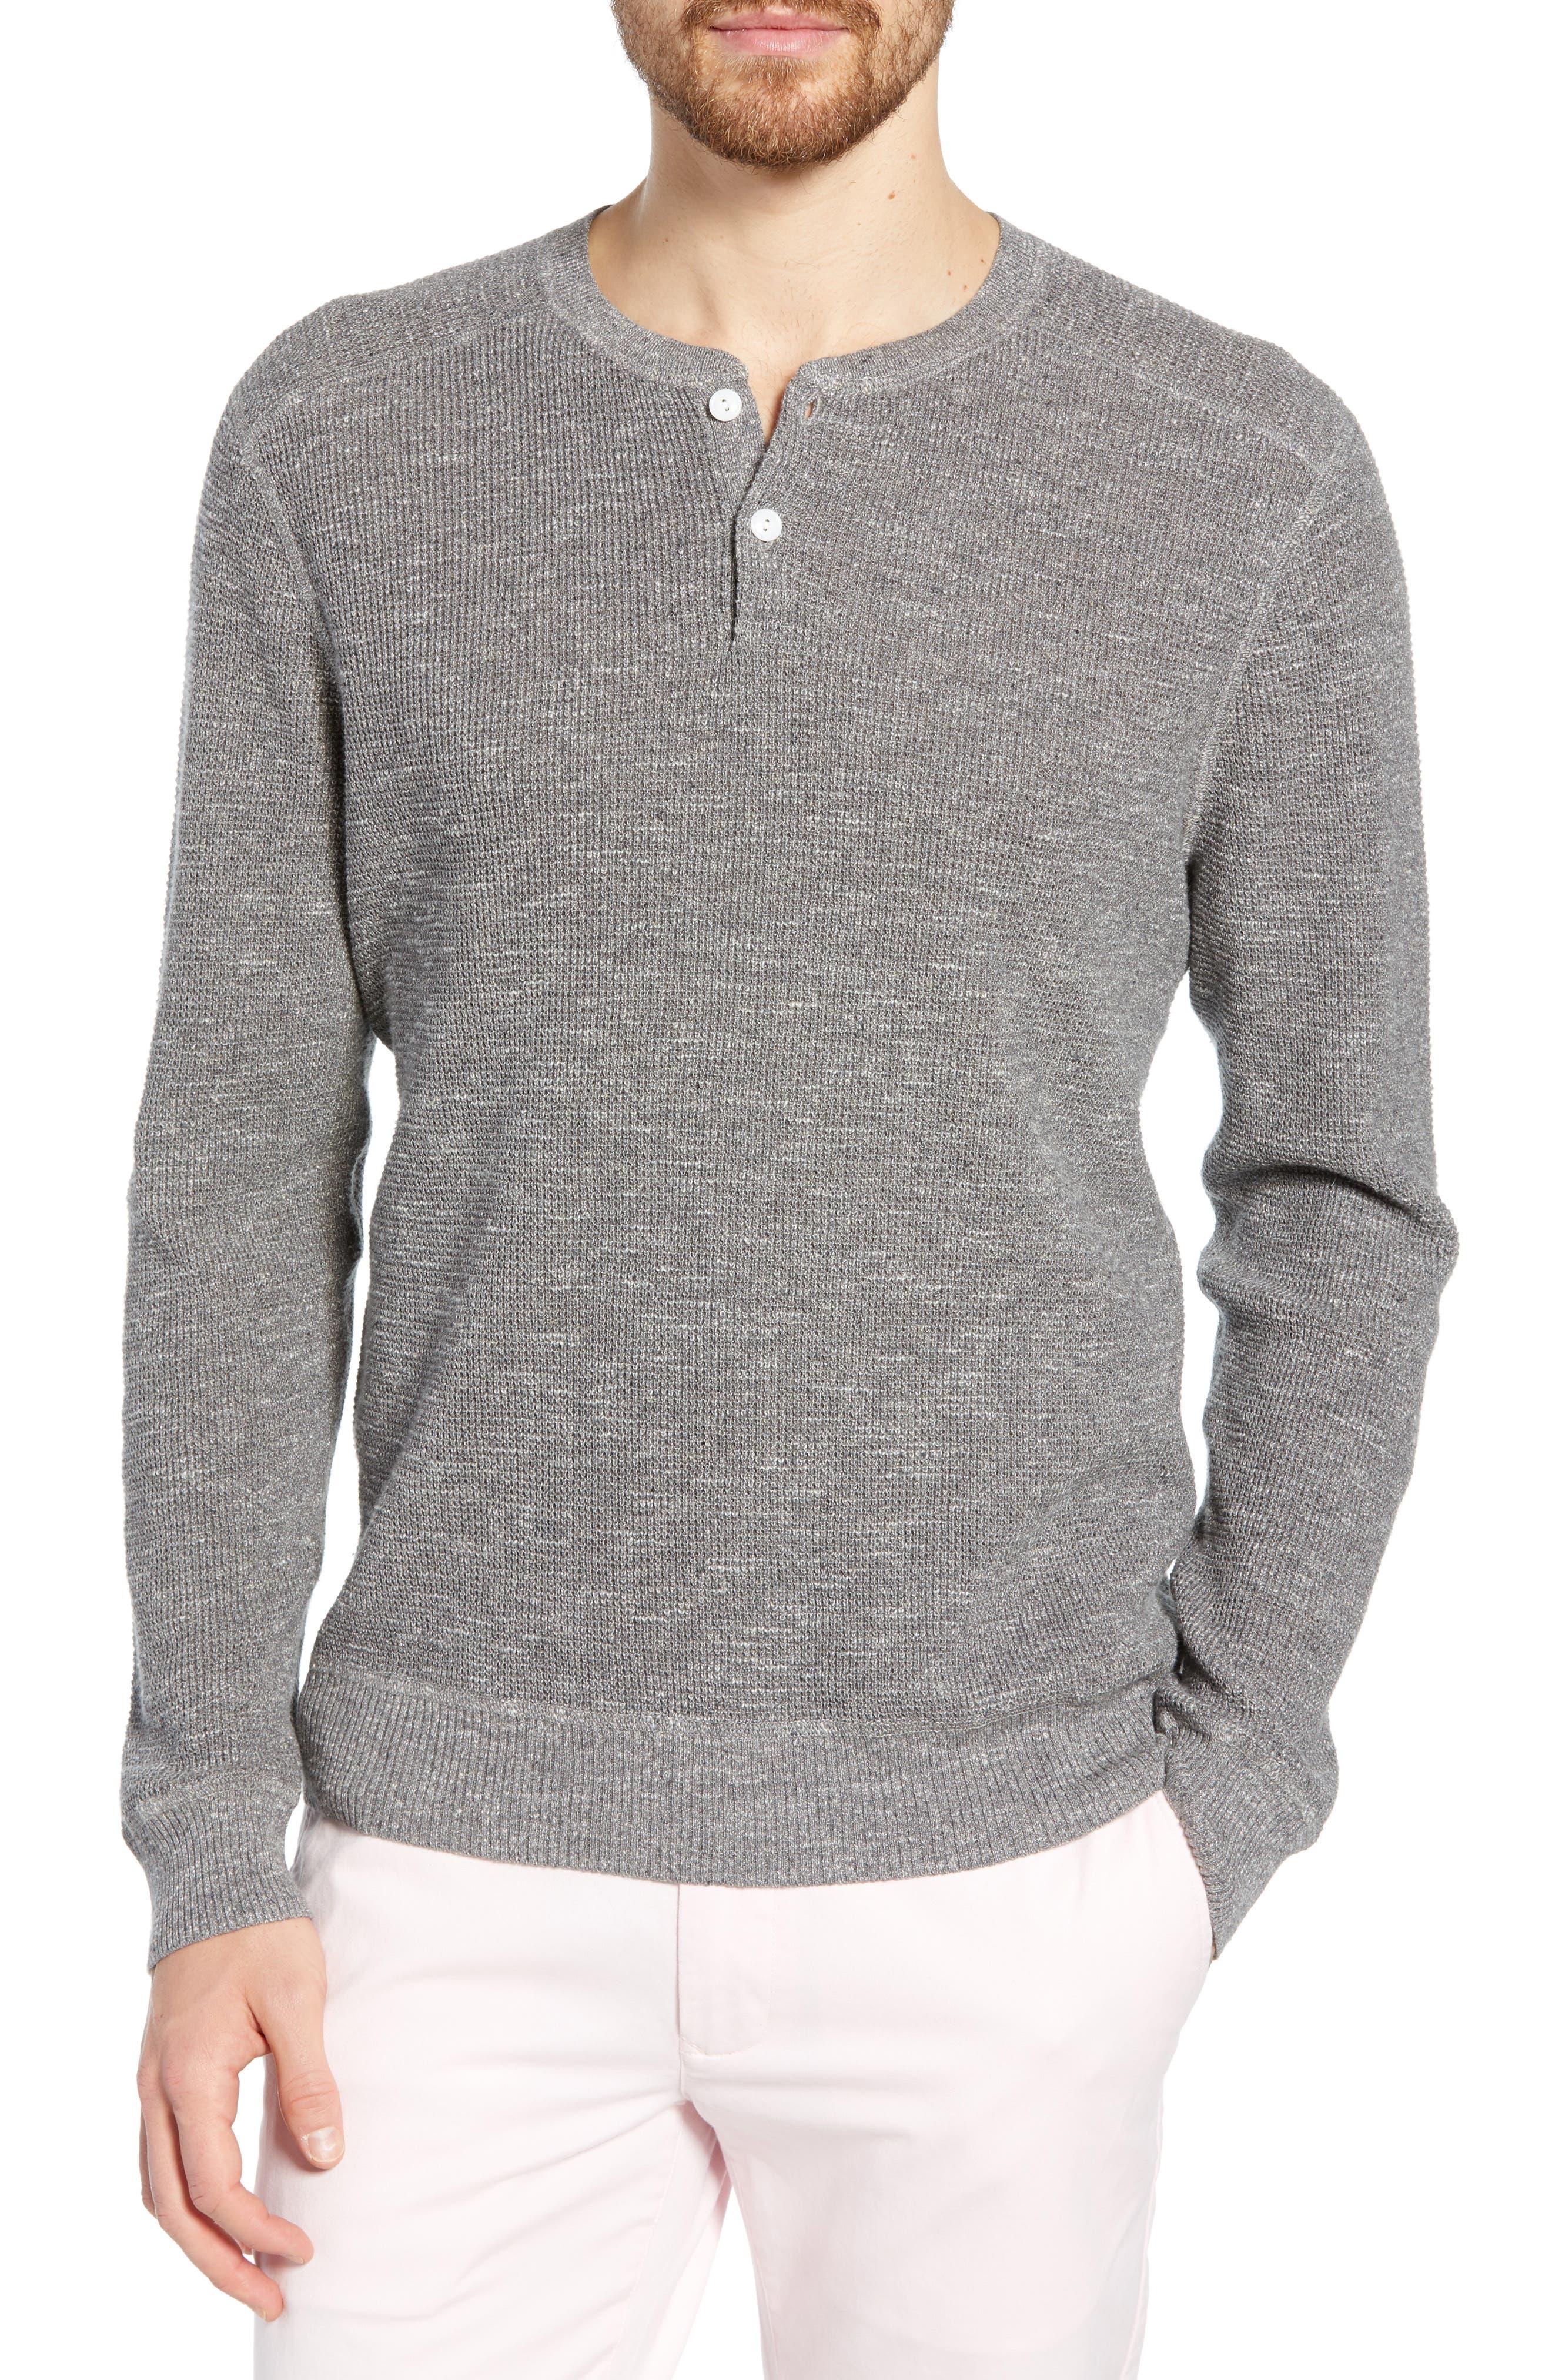 Bonobos Cotton & Linen Slim Fit Henley Sweater, Grey